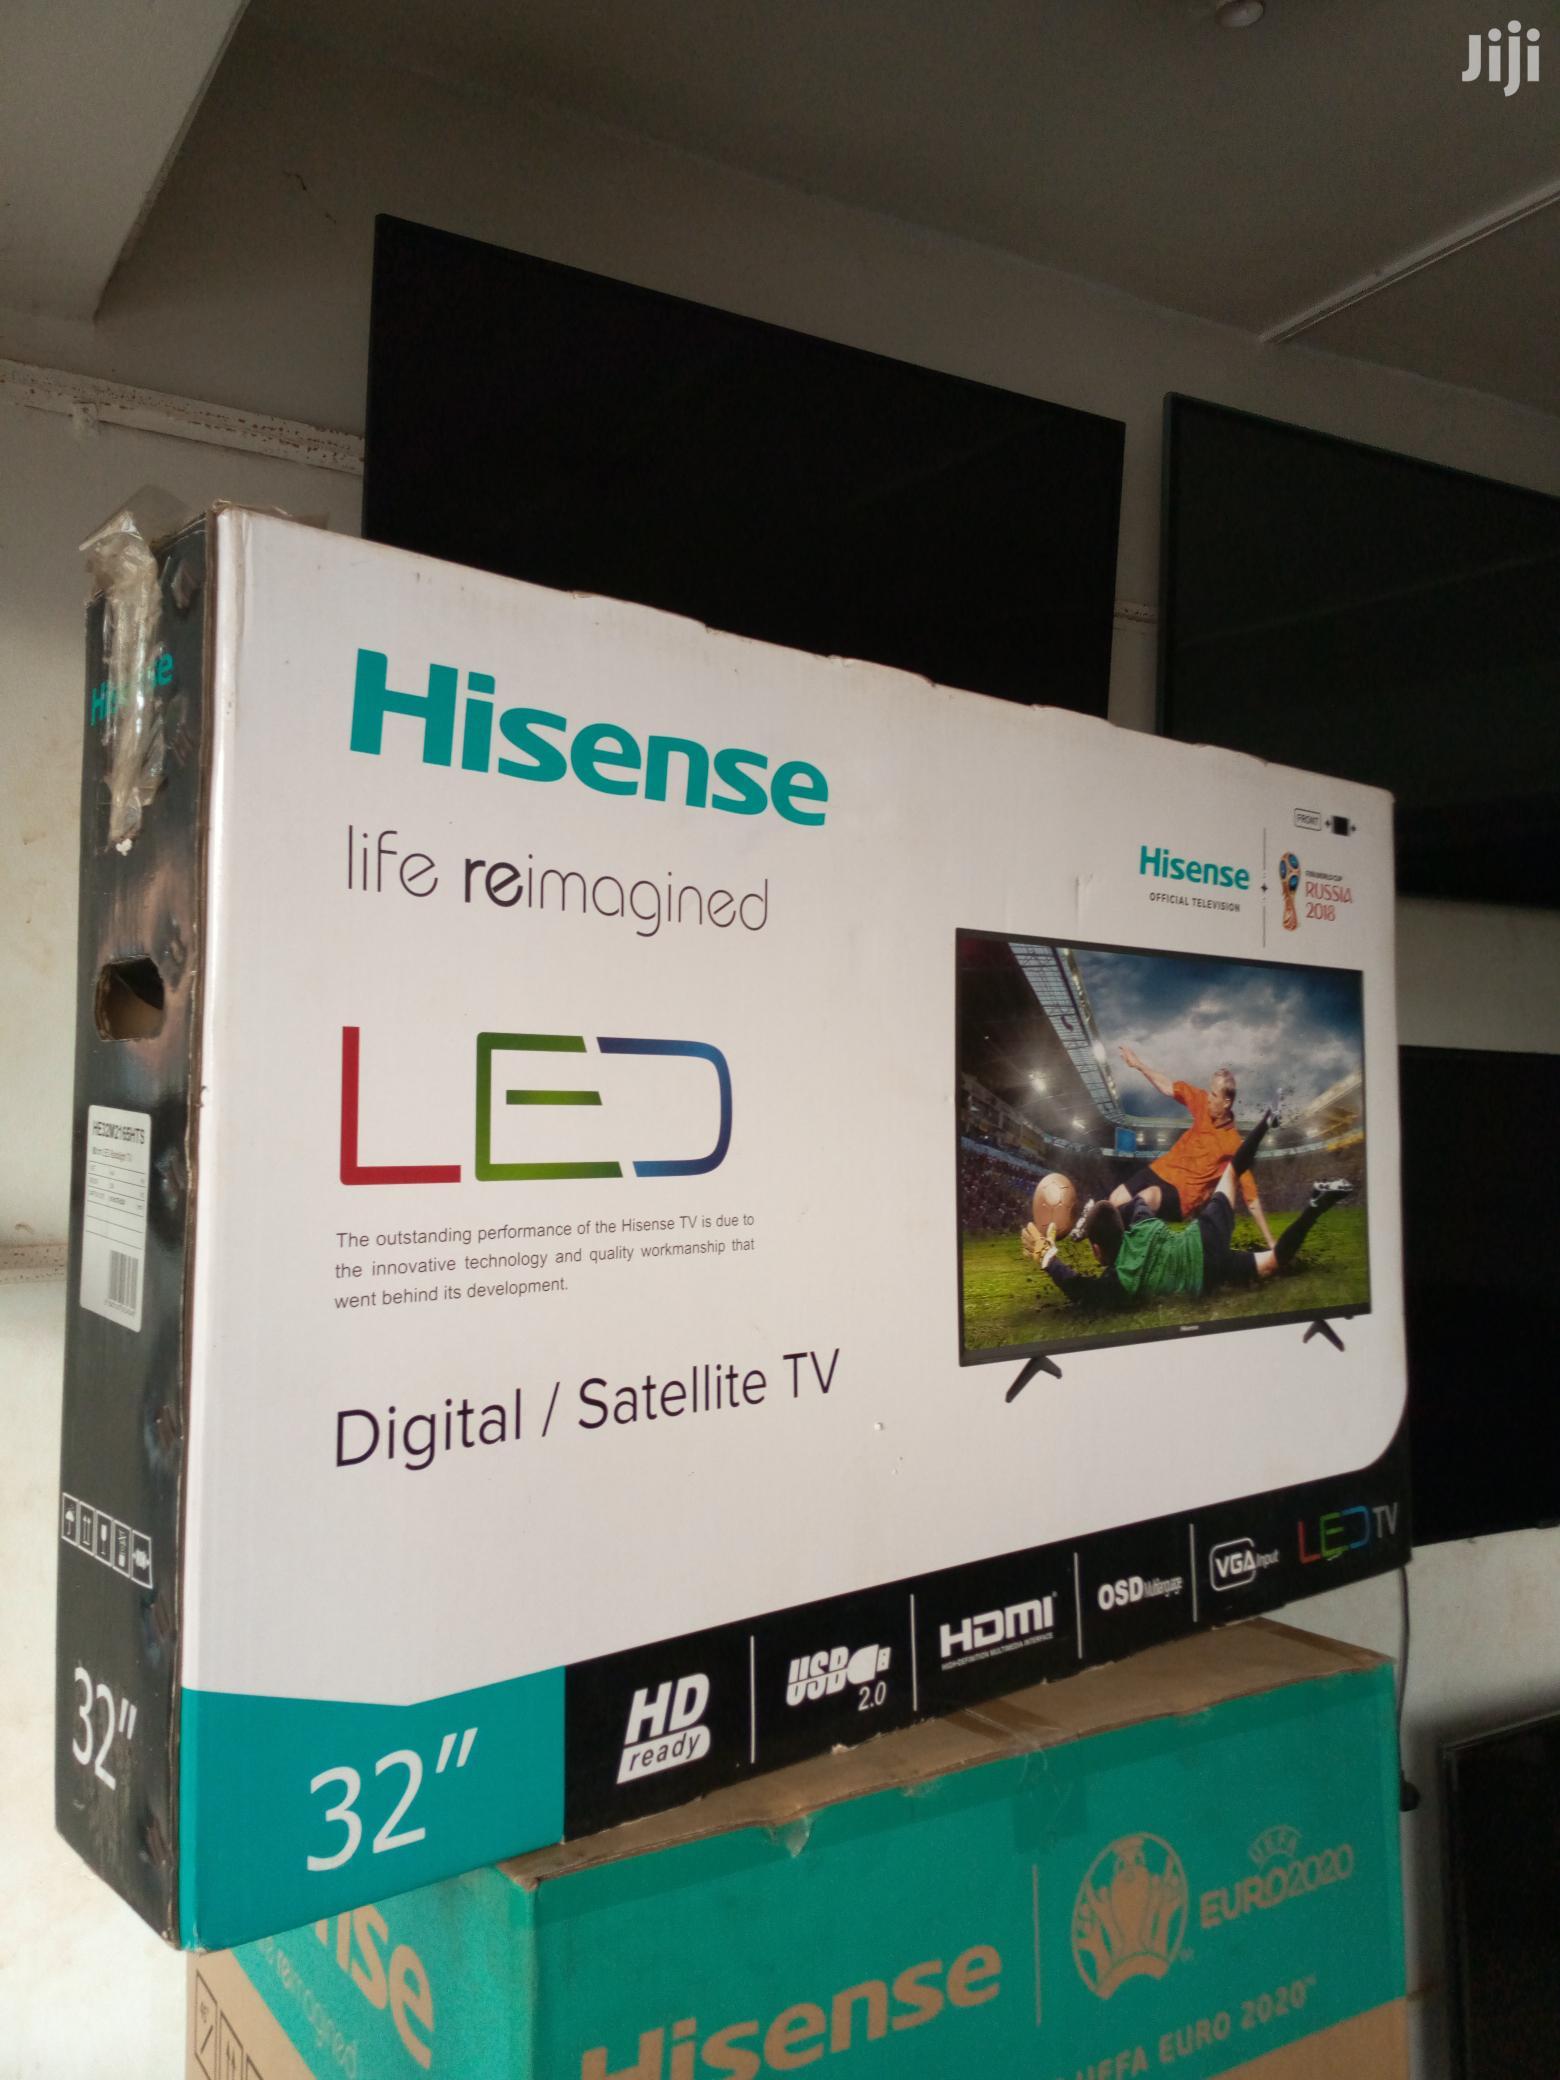 Hisense Digital Satellite Full HD Led Flat Screen Tv 32 Inches